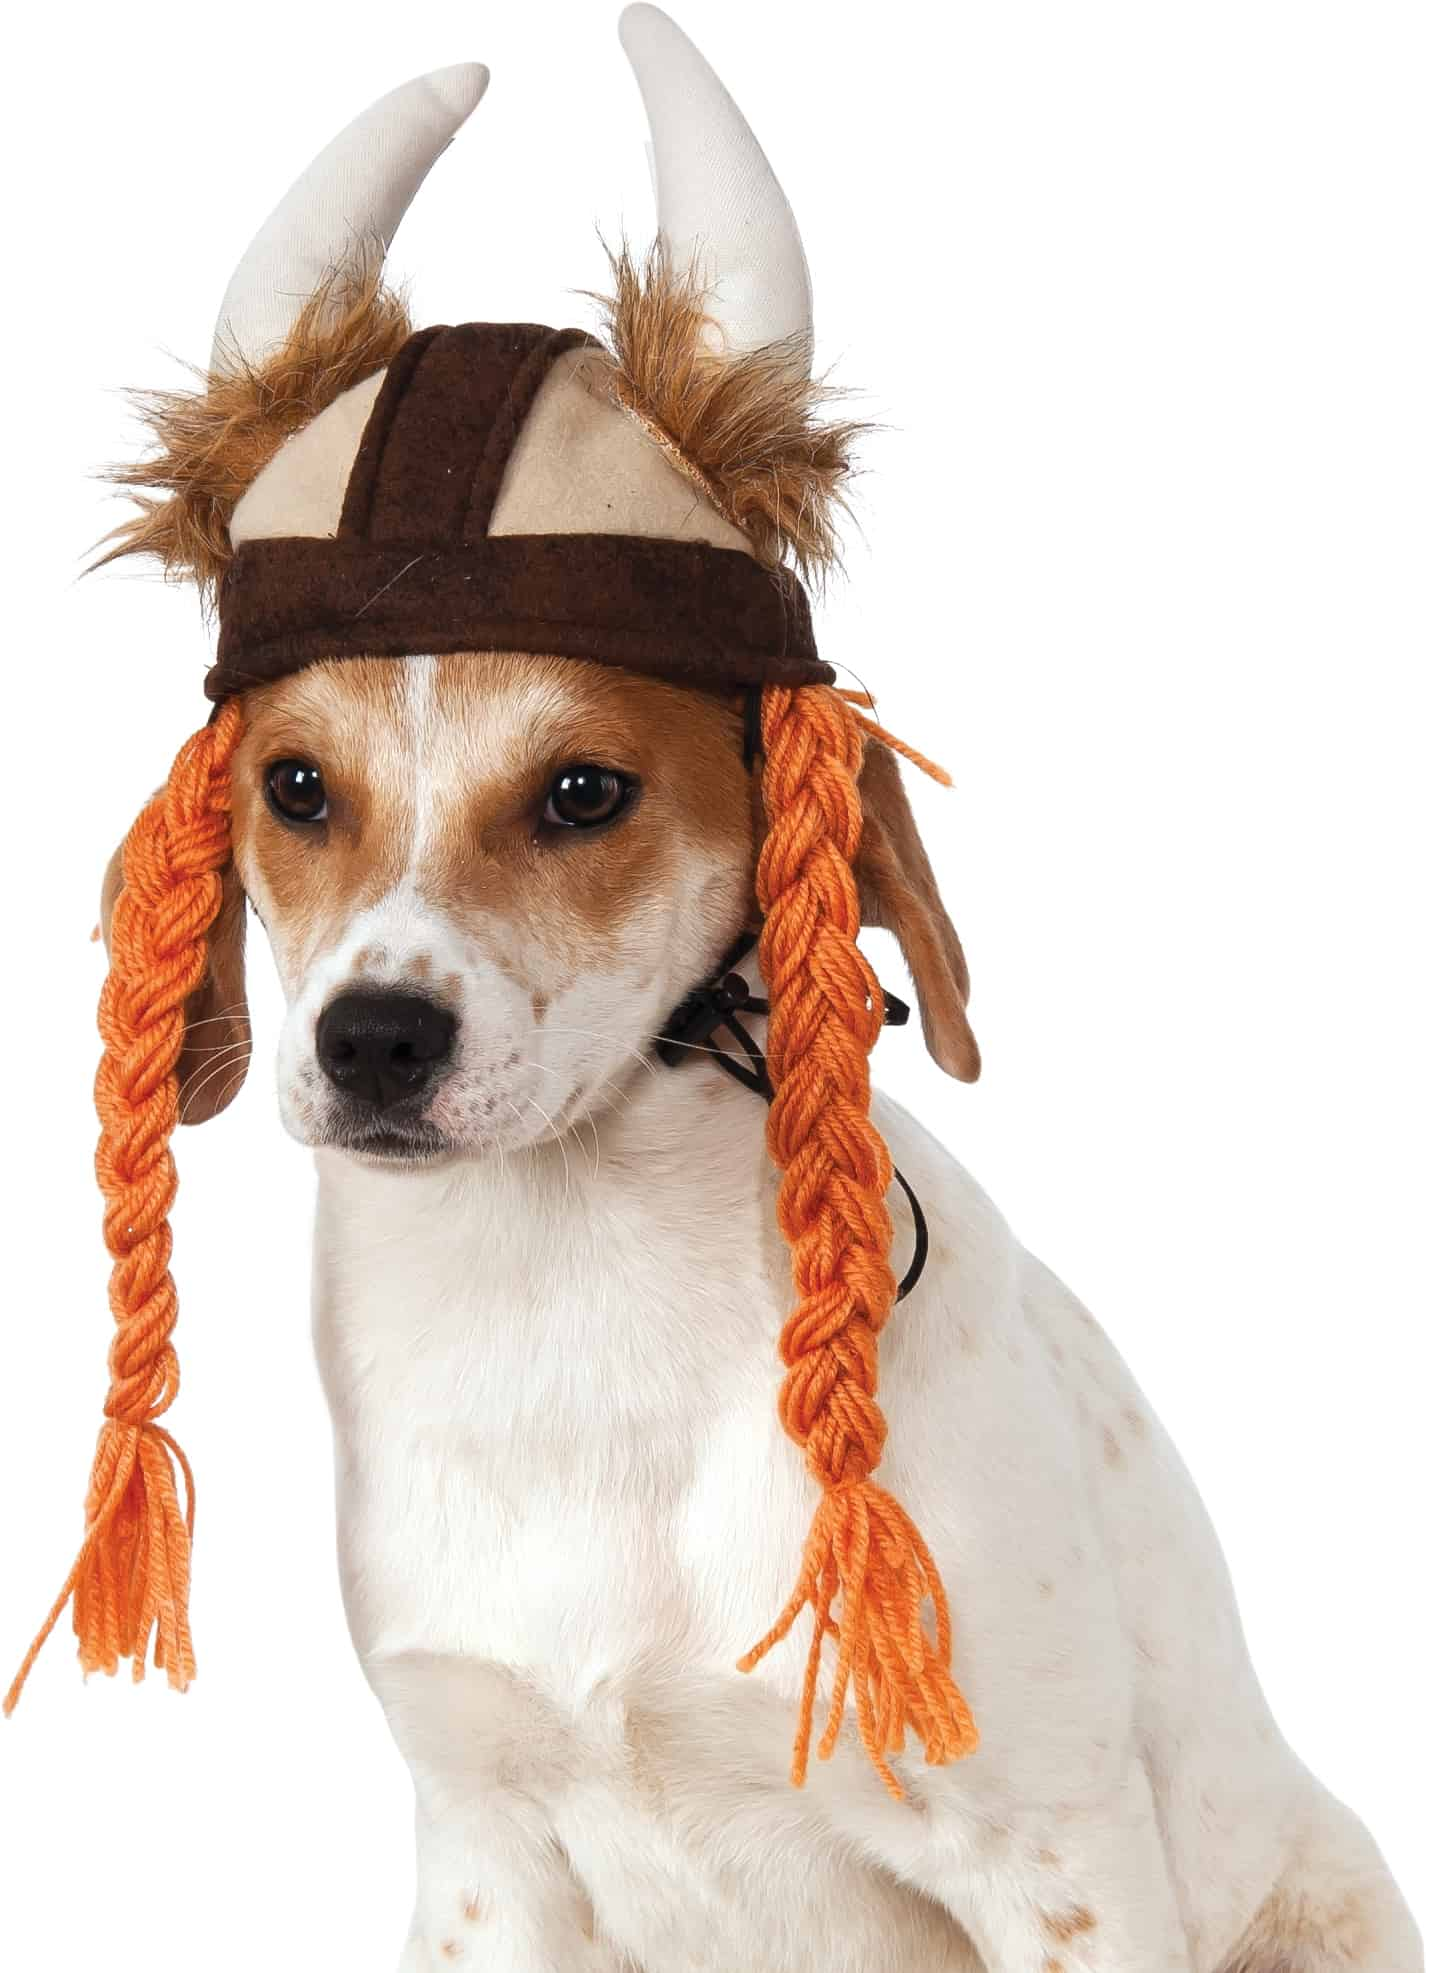 Dog Viking Hat with Braids